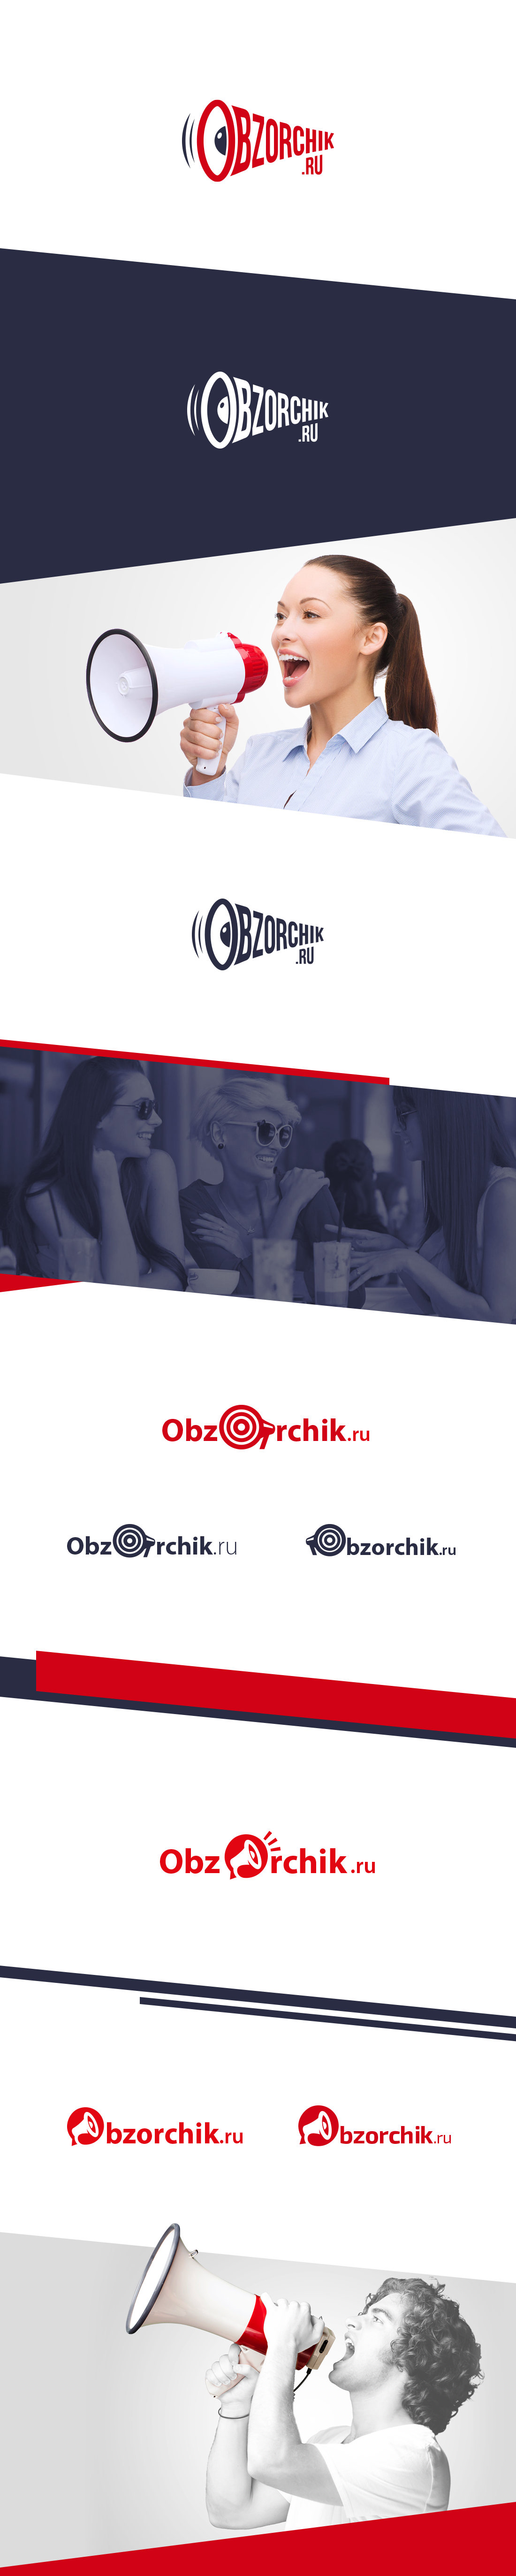 Obzorchik.ru - сервис обзоров и отзывов